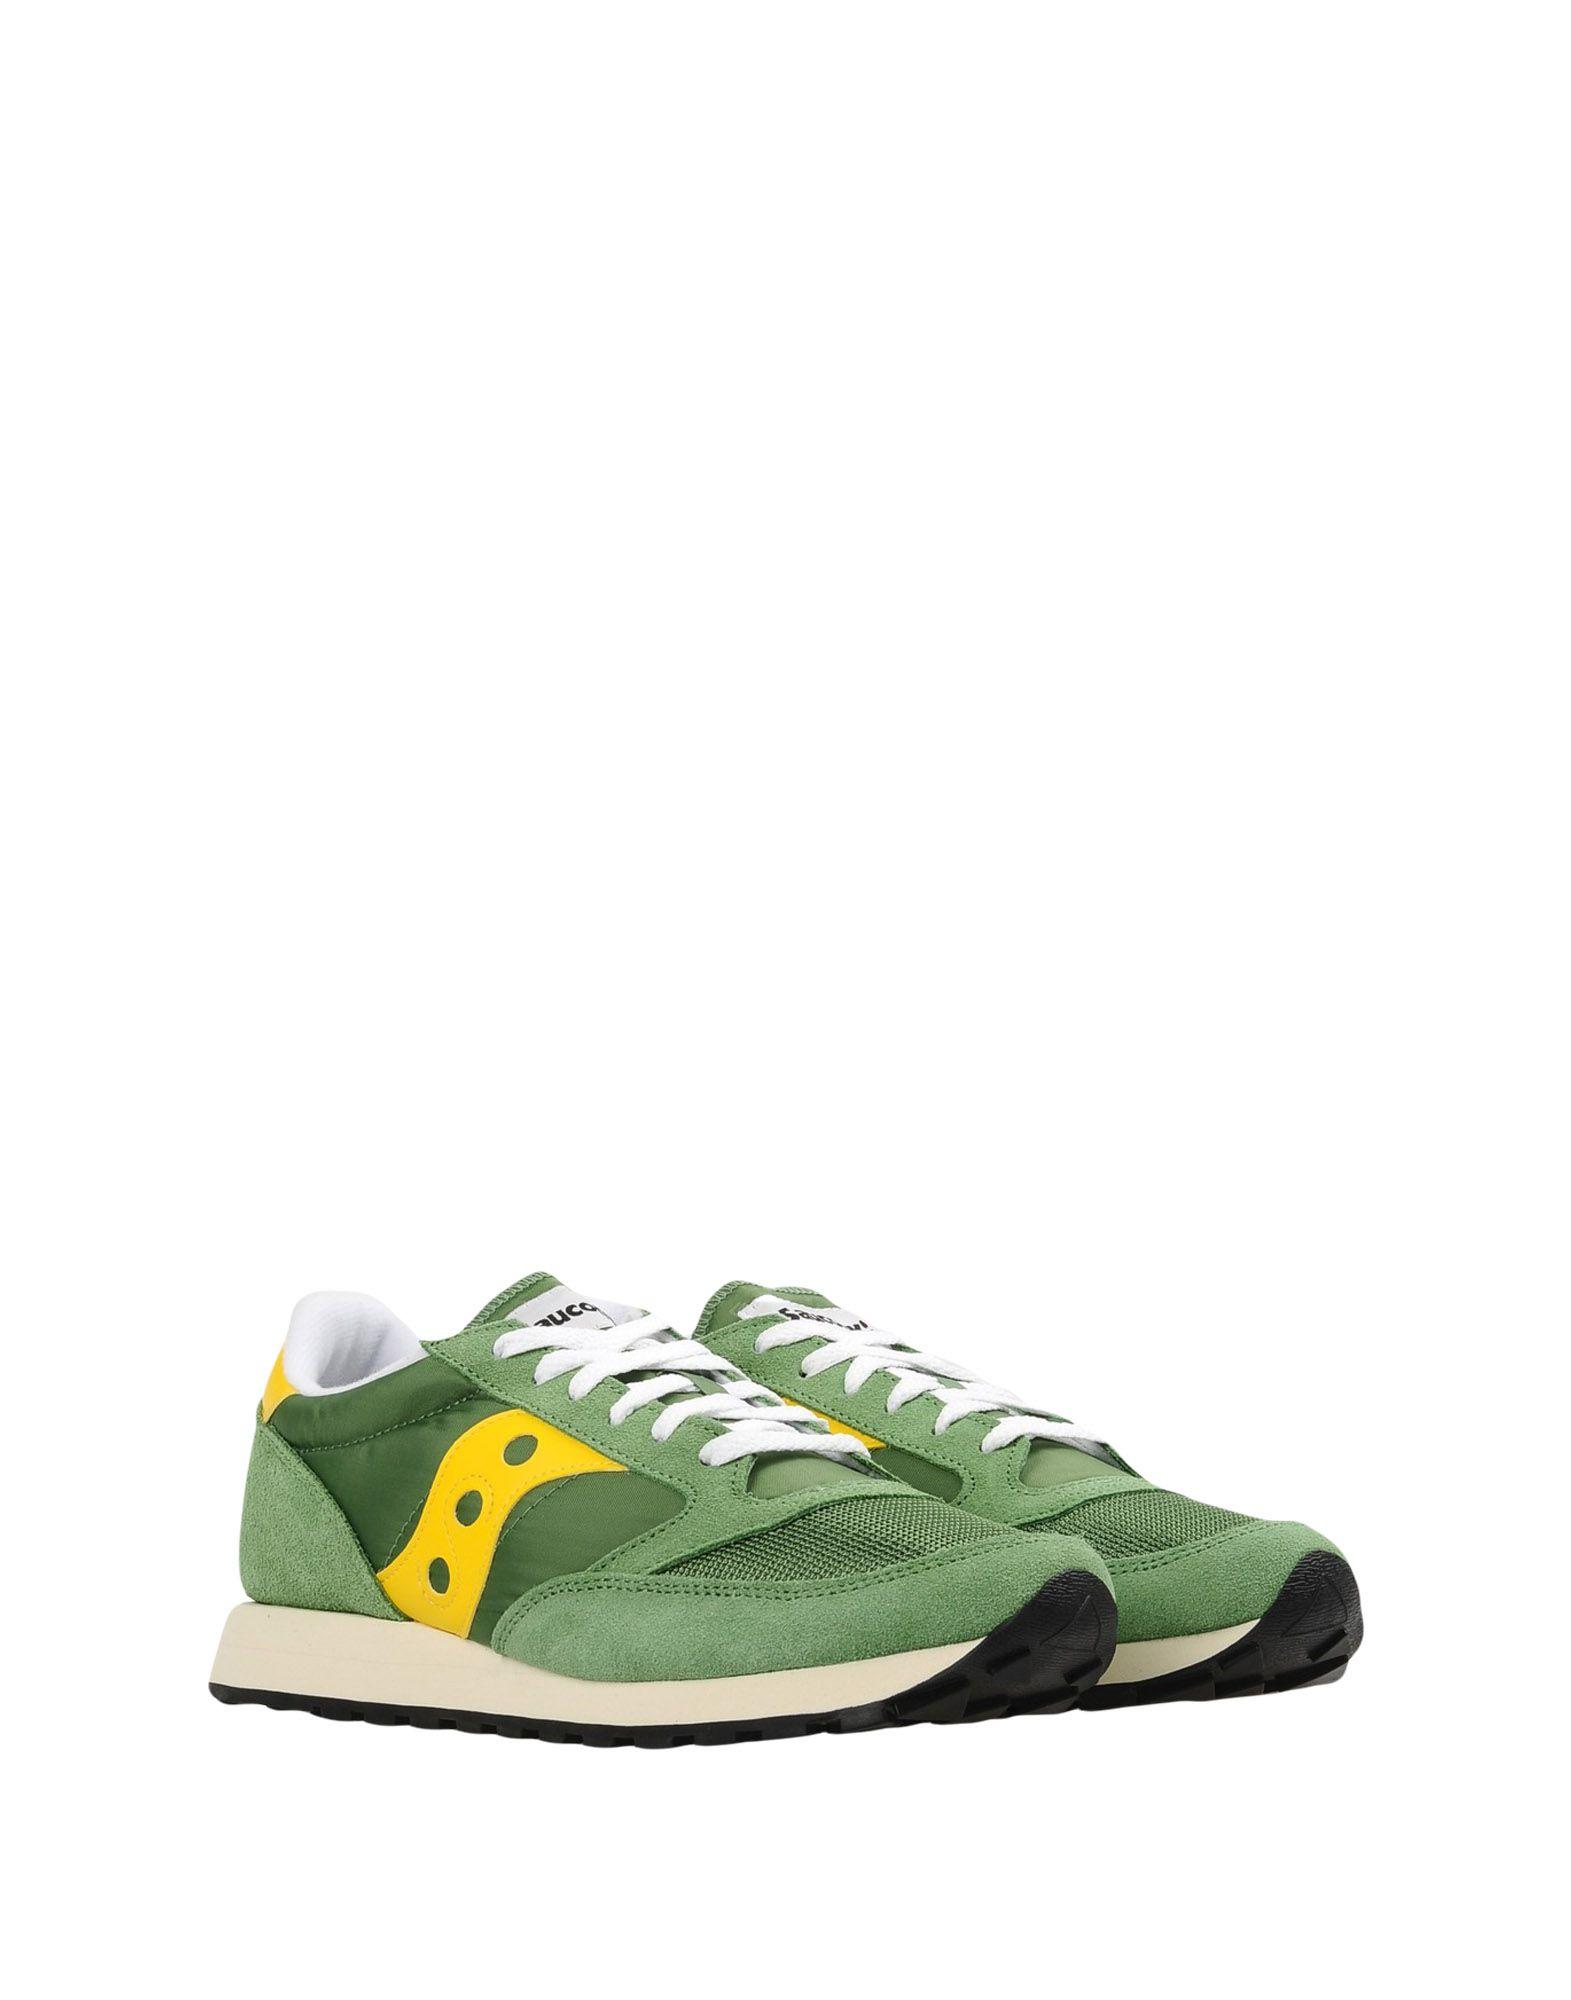 Sneakers Saucony Jazz O Vintage - Homme - Sneakers Saucony sur